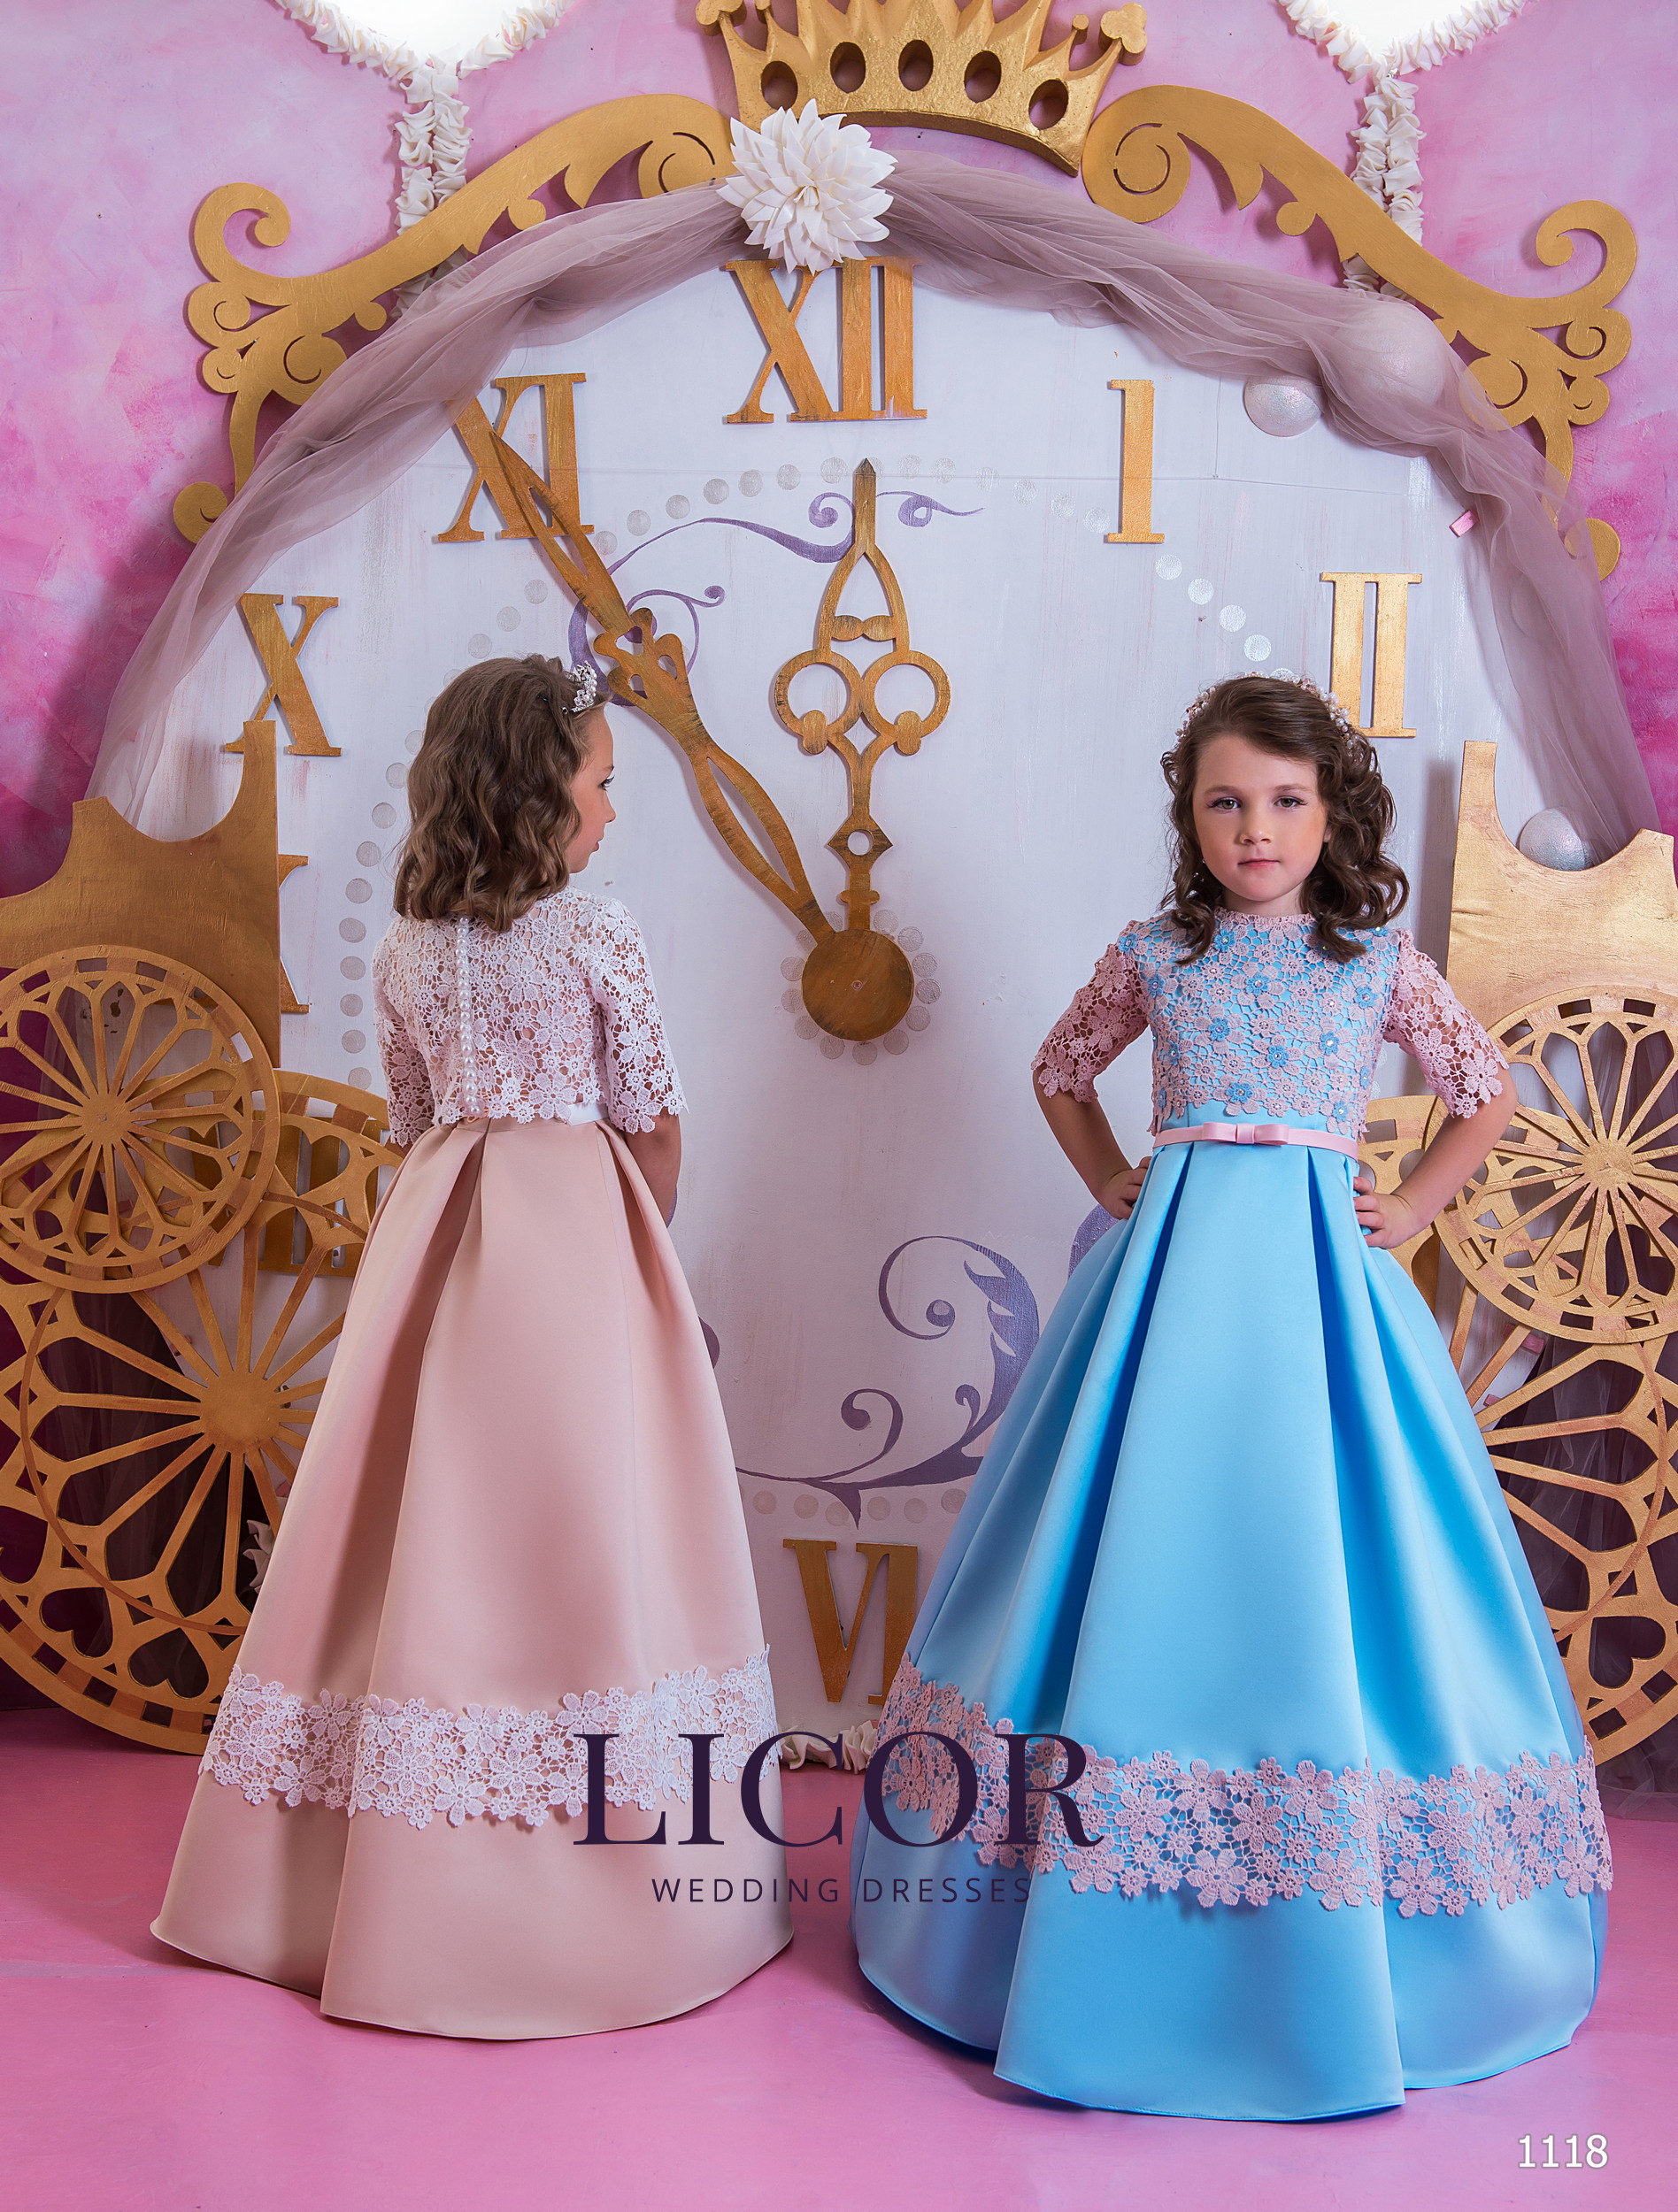 https://licor.com.ua/images/stories/virtuemart/product/1118(1).jpg